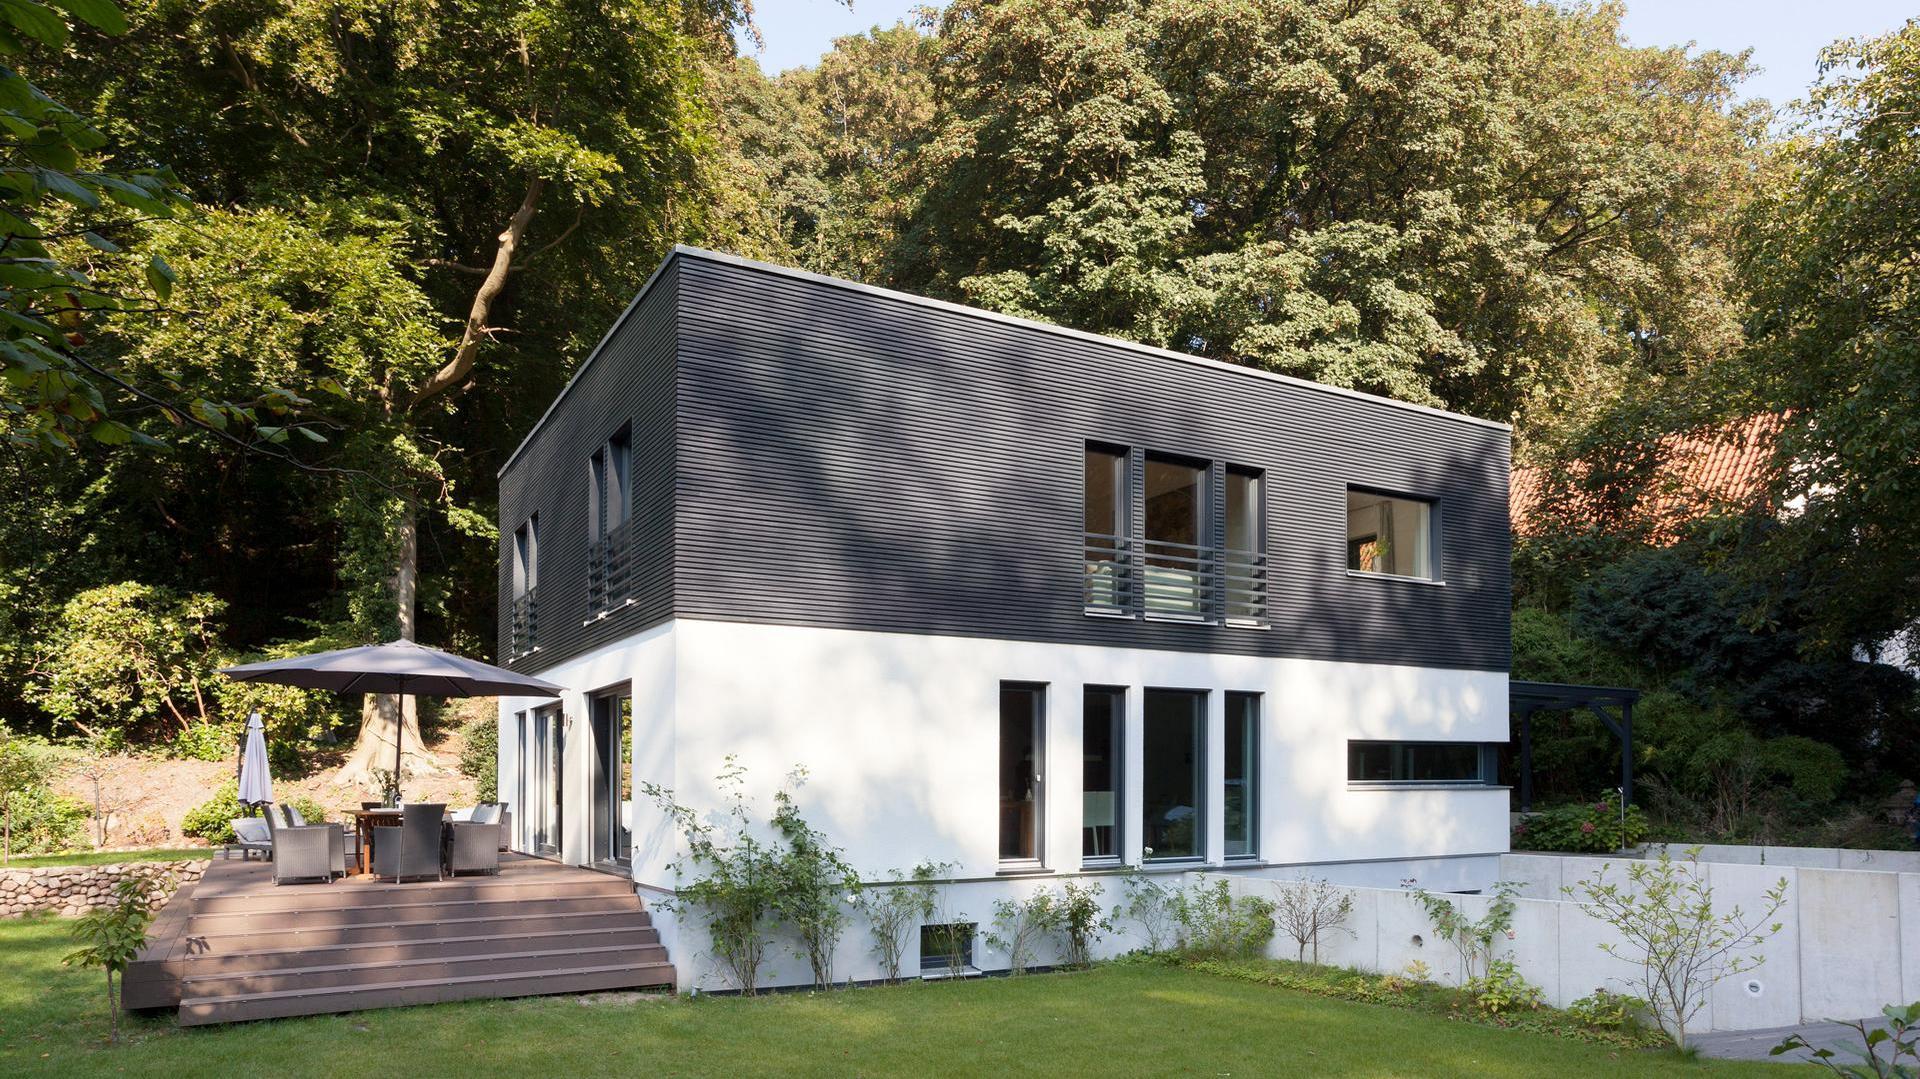 fertigh user test schw rerhaus ist testsieger. Black Bedroom Furniture Sets. Home Design Ideas